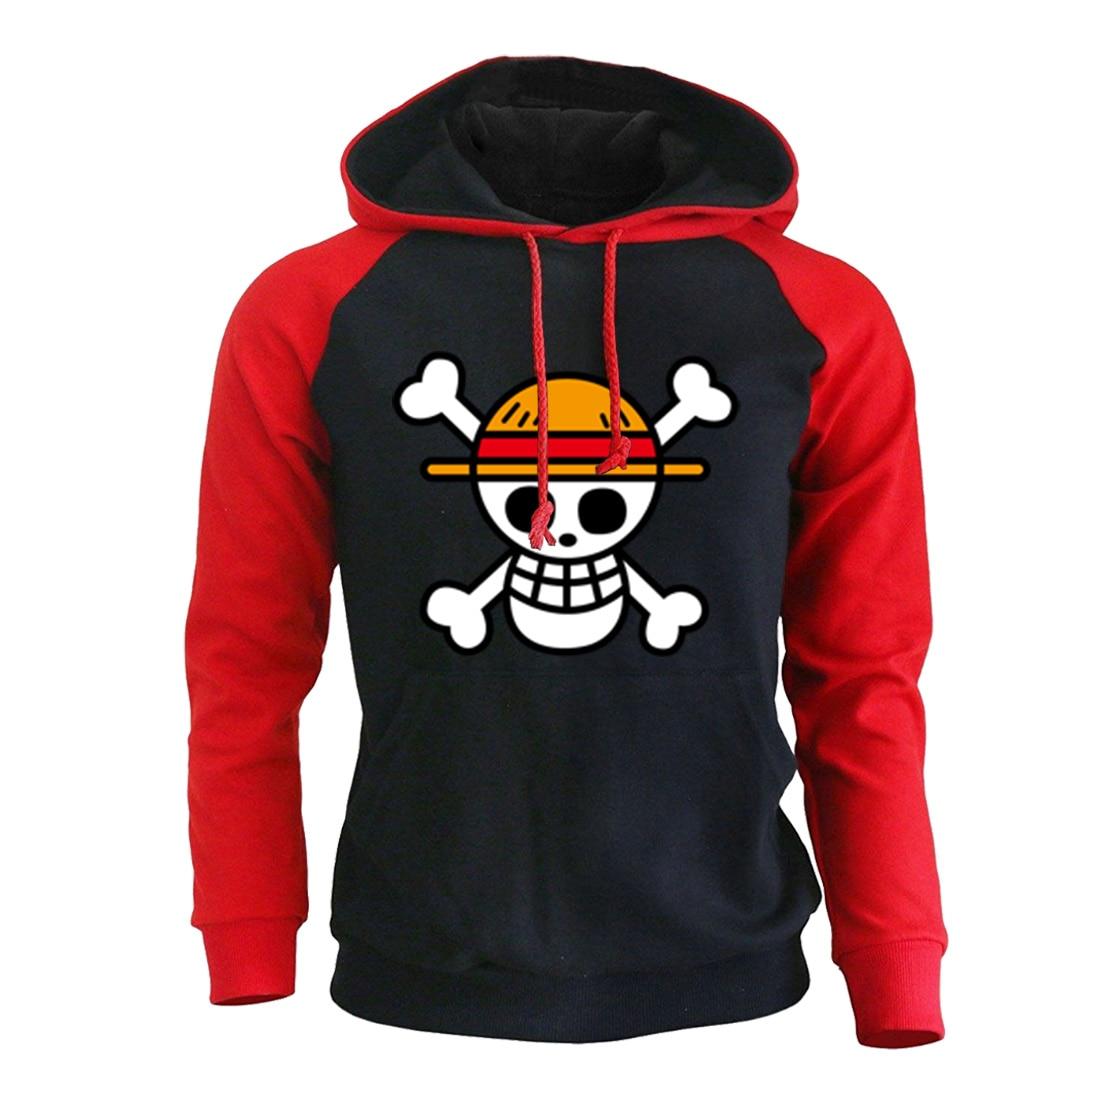 One Piece Luffy Cartoon Print Hoodie Sweatshirts 2019 Autumn Winter Men Hoodies With Cap Anime Harajuke Men's Hoody Pullover